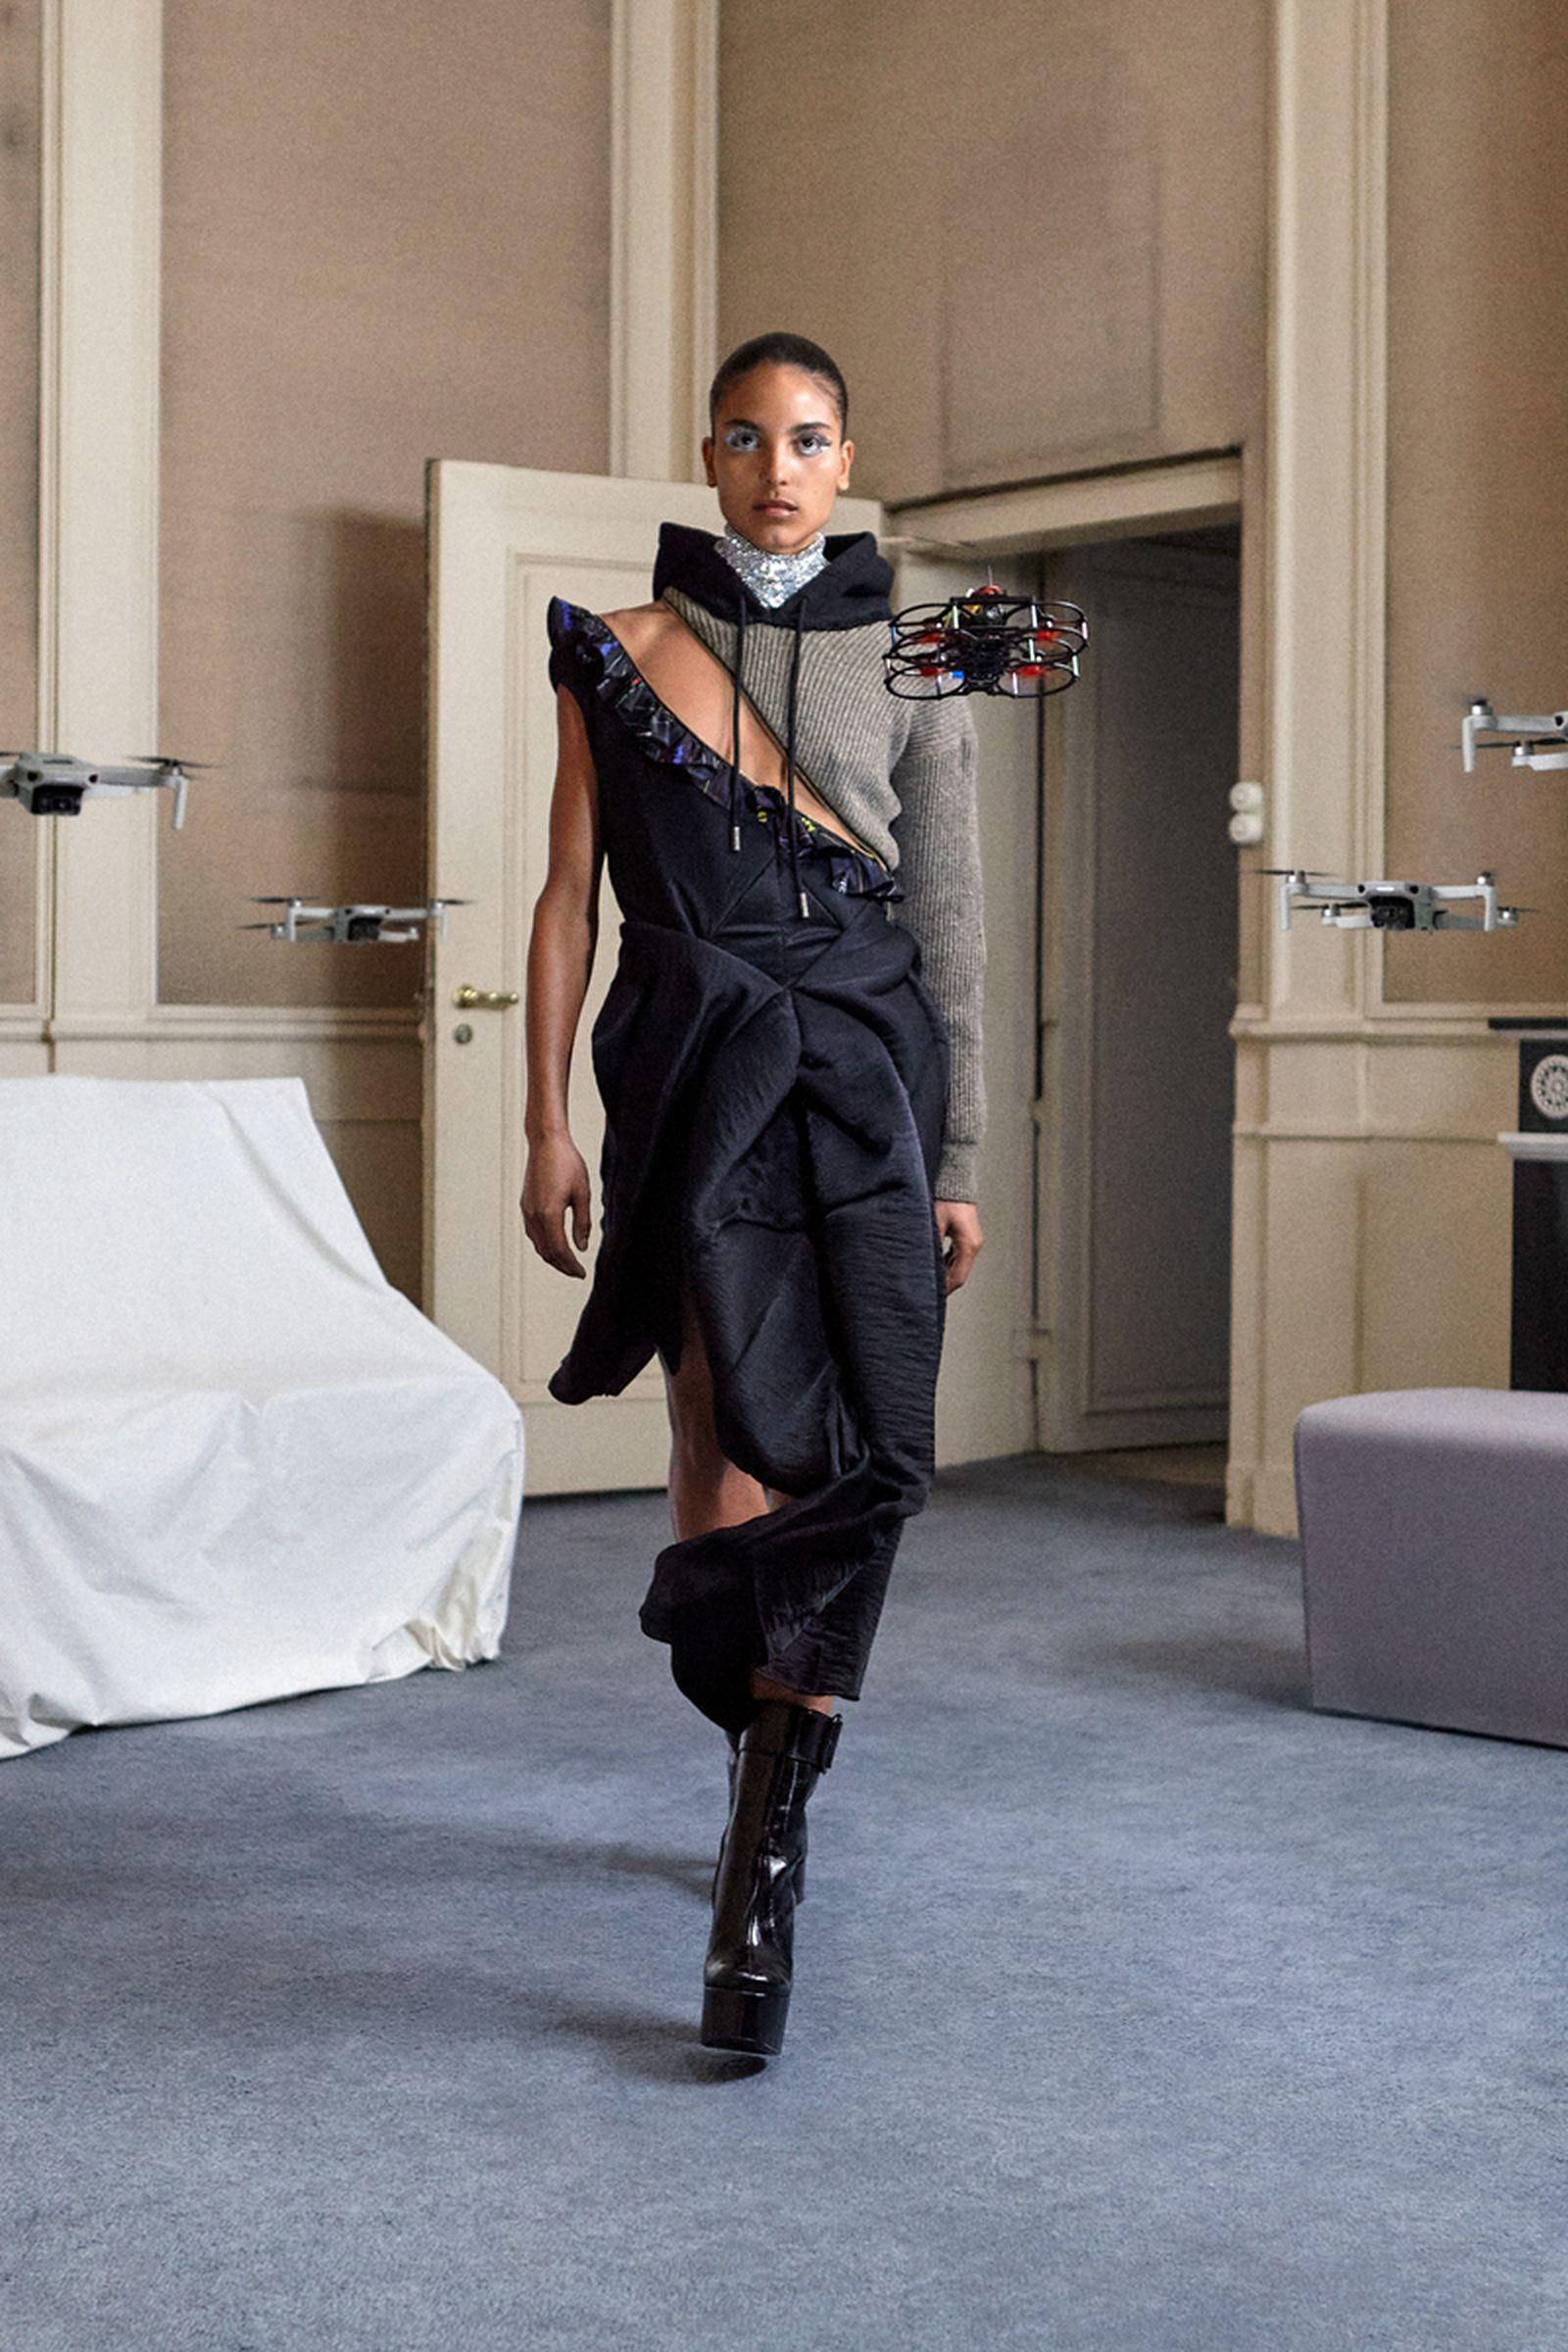 duran-lantink-drone-runway-show-fw21- (16)